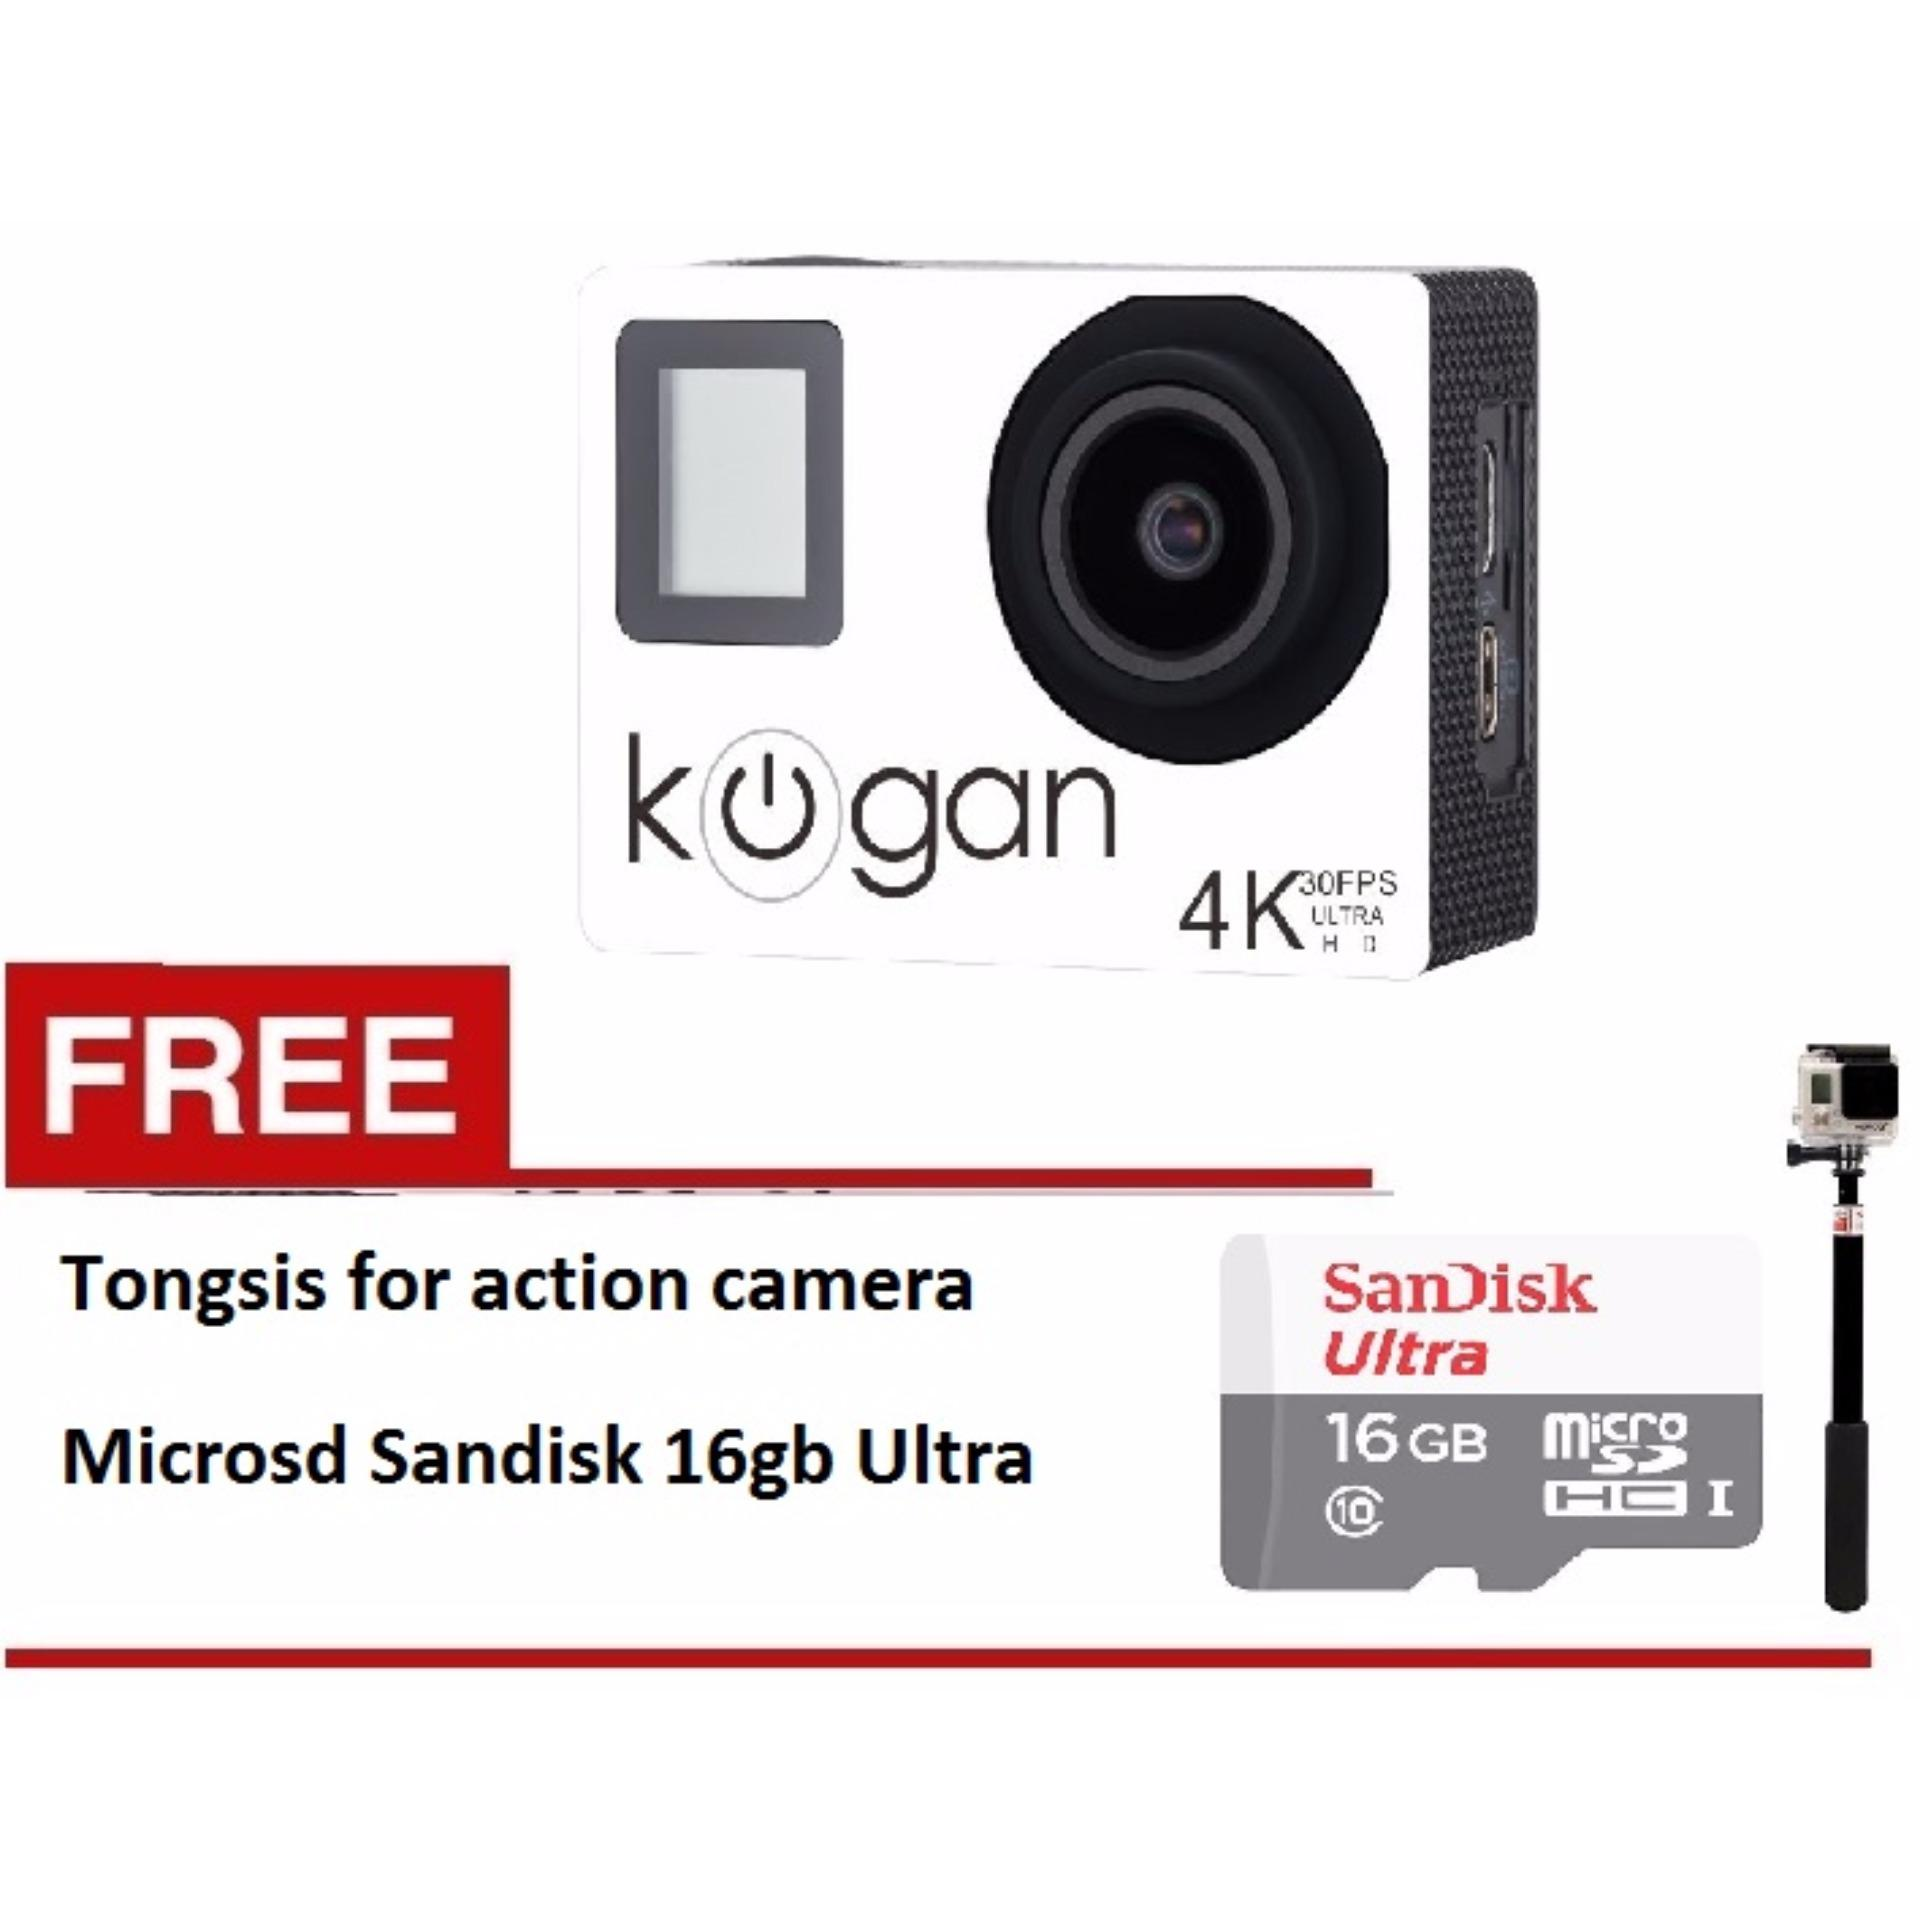 ... Kogan Action Camera 4K NV UltraHD - 16MP - Putih - WIFI + microsd16gb class 10 ...